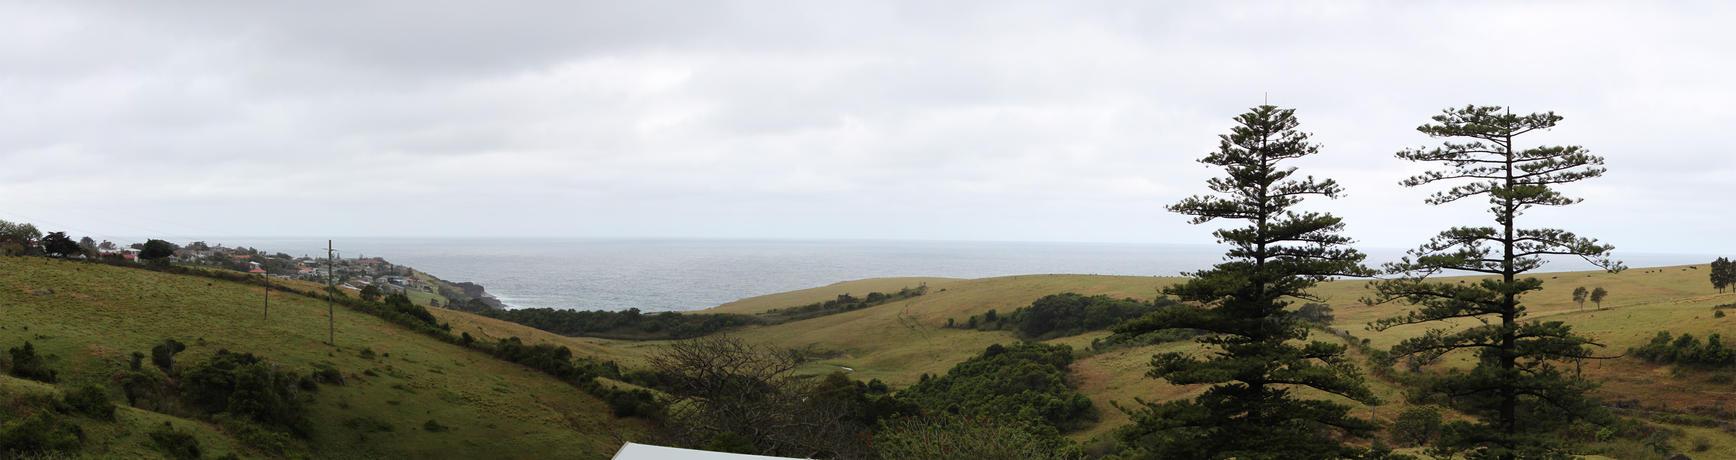 Bushbank Panorama 2 by TarJakArt